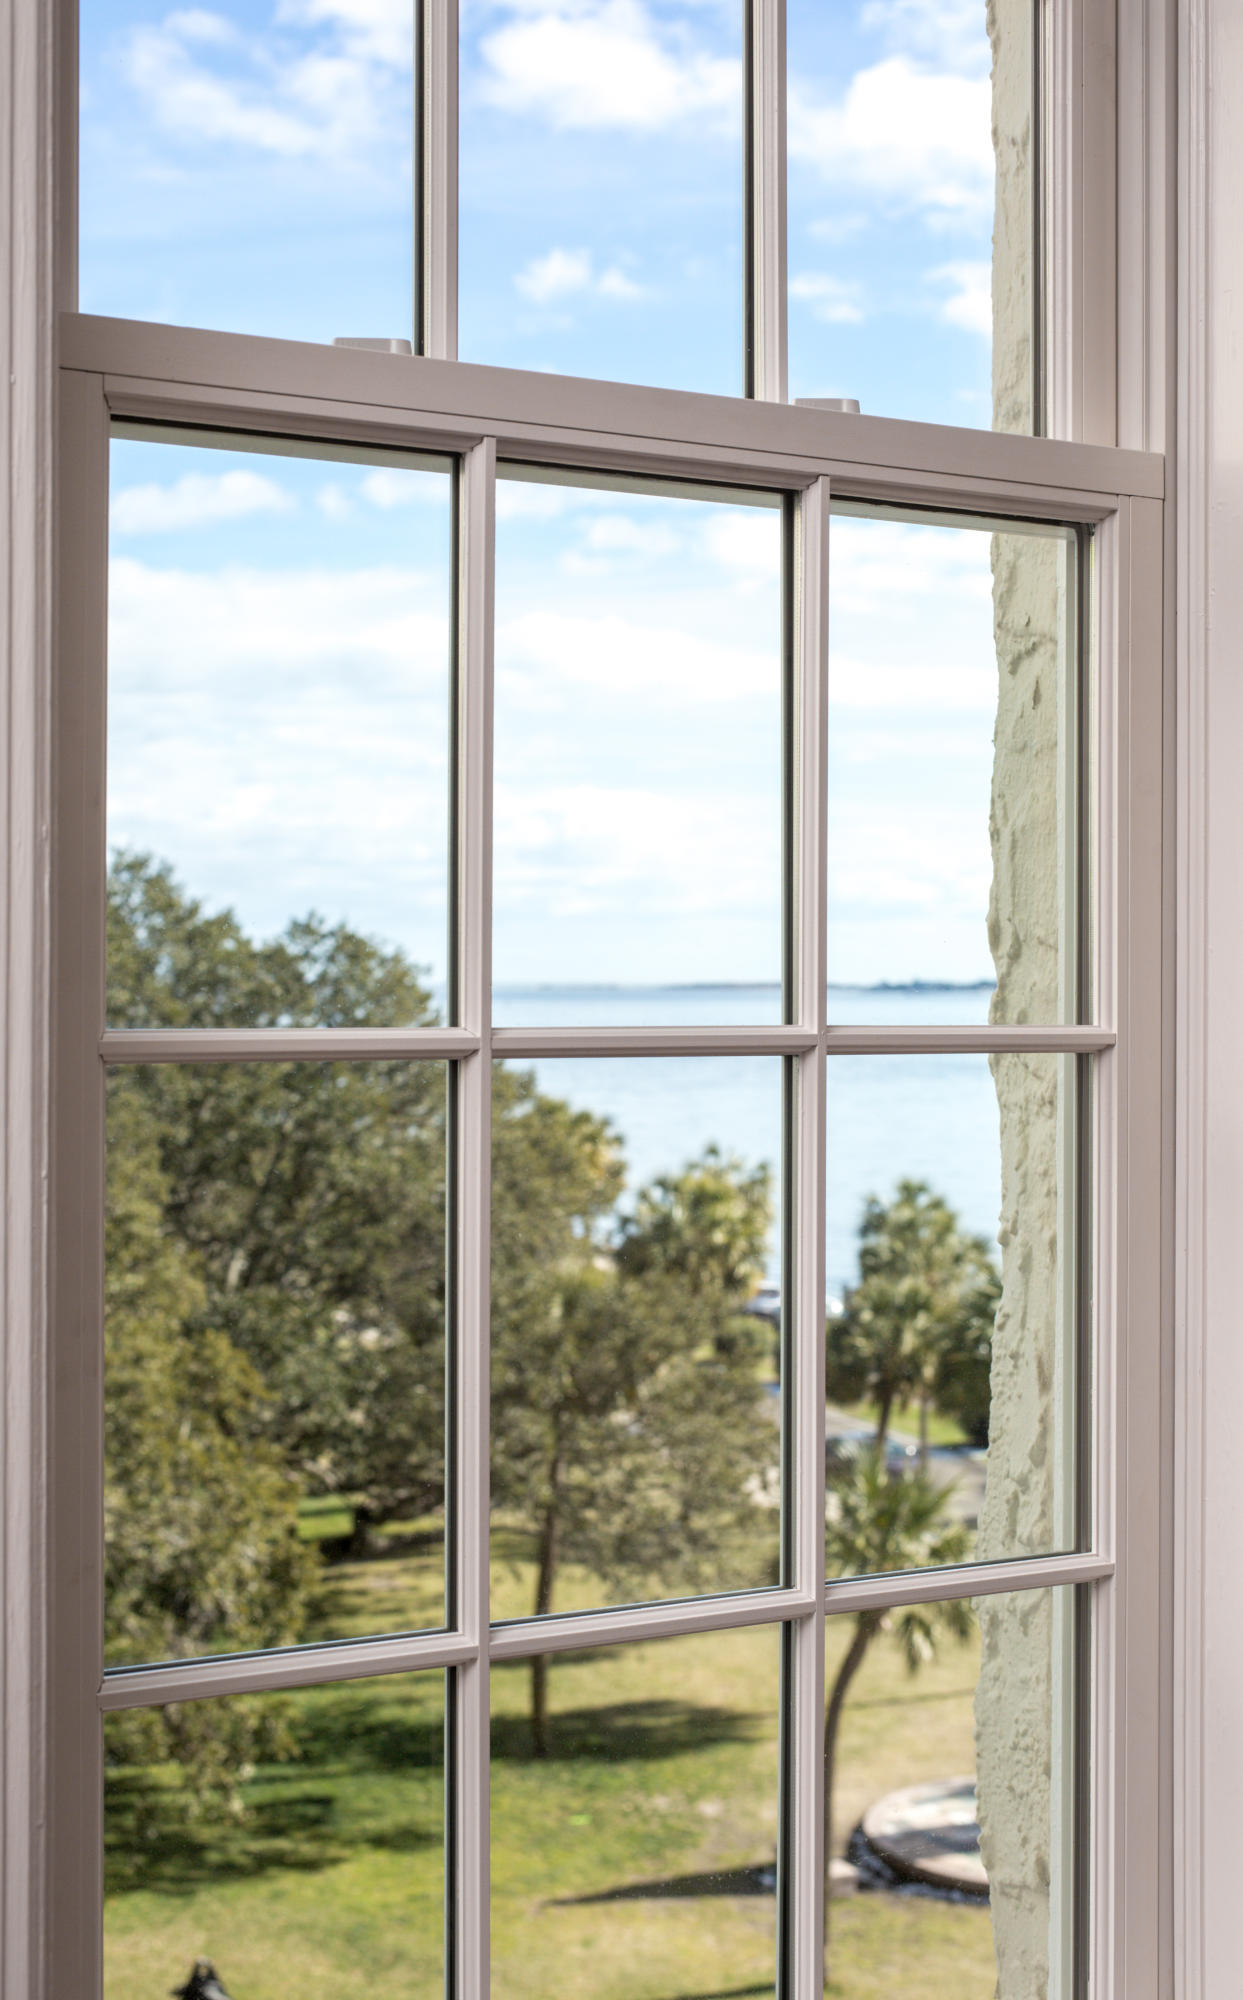 Fort Sumter House Homes For Sale - 1 King, Charleston, SC - 21